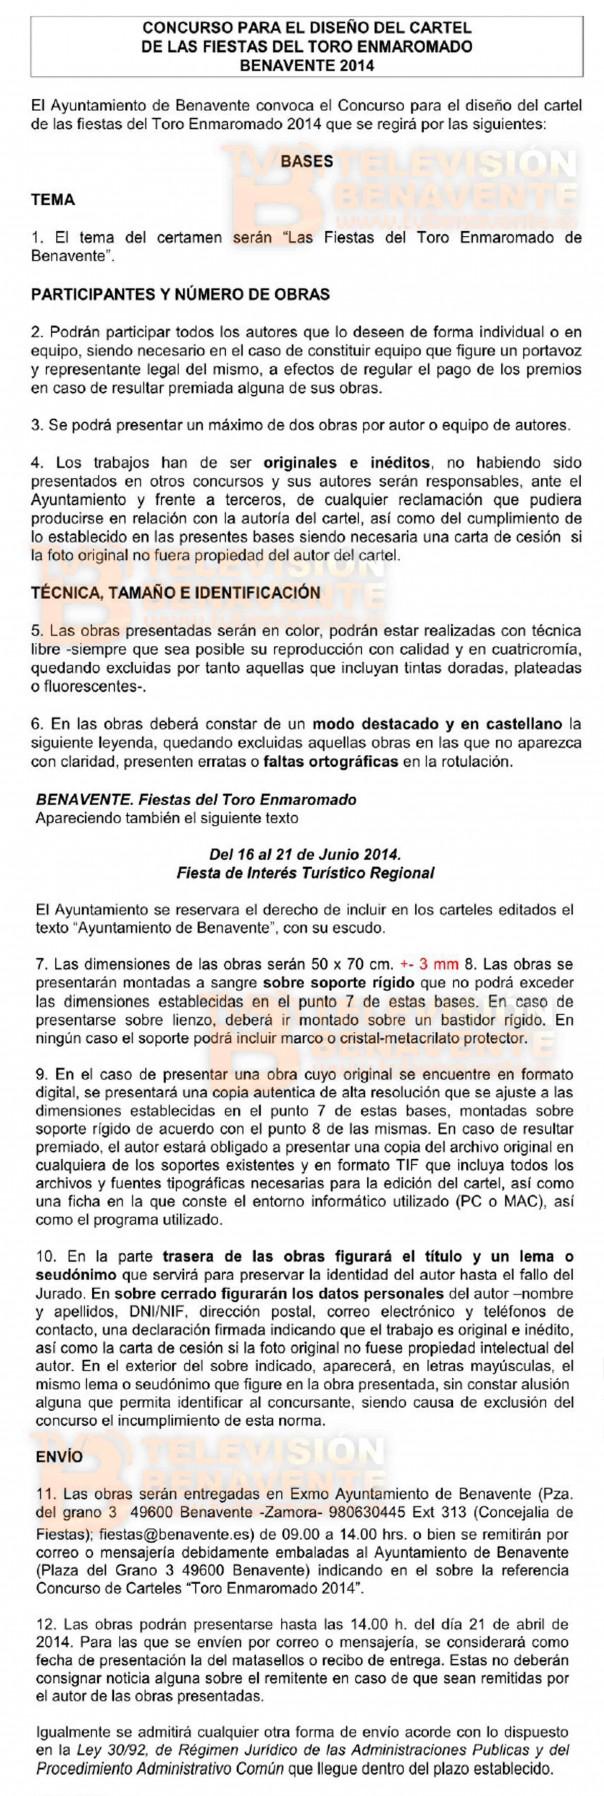 bases cartel toro 2014_1